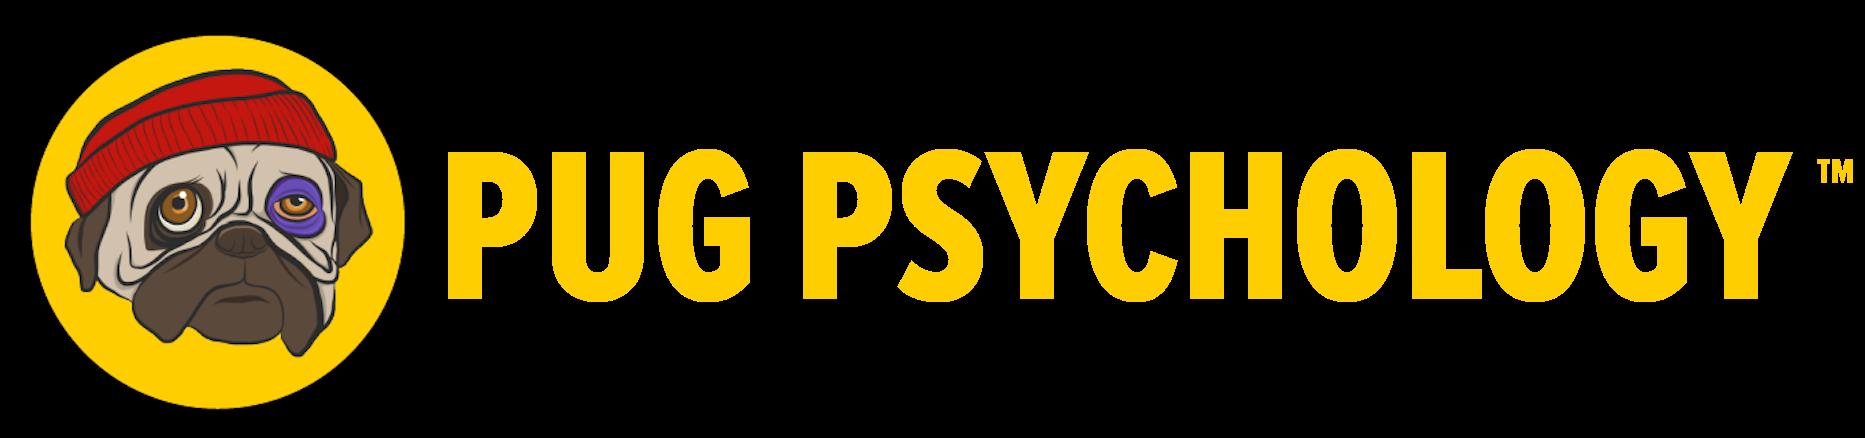 pugpsychlogo.png